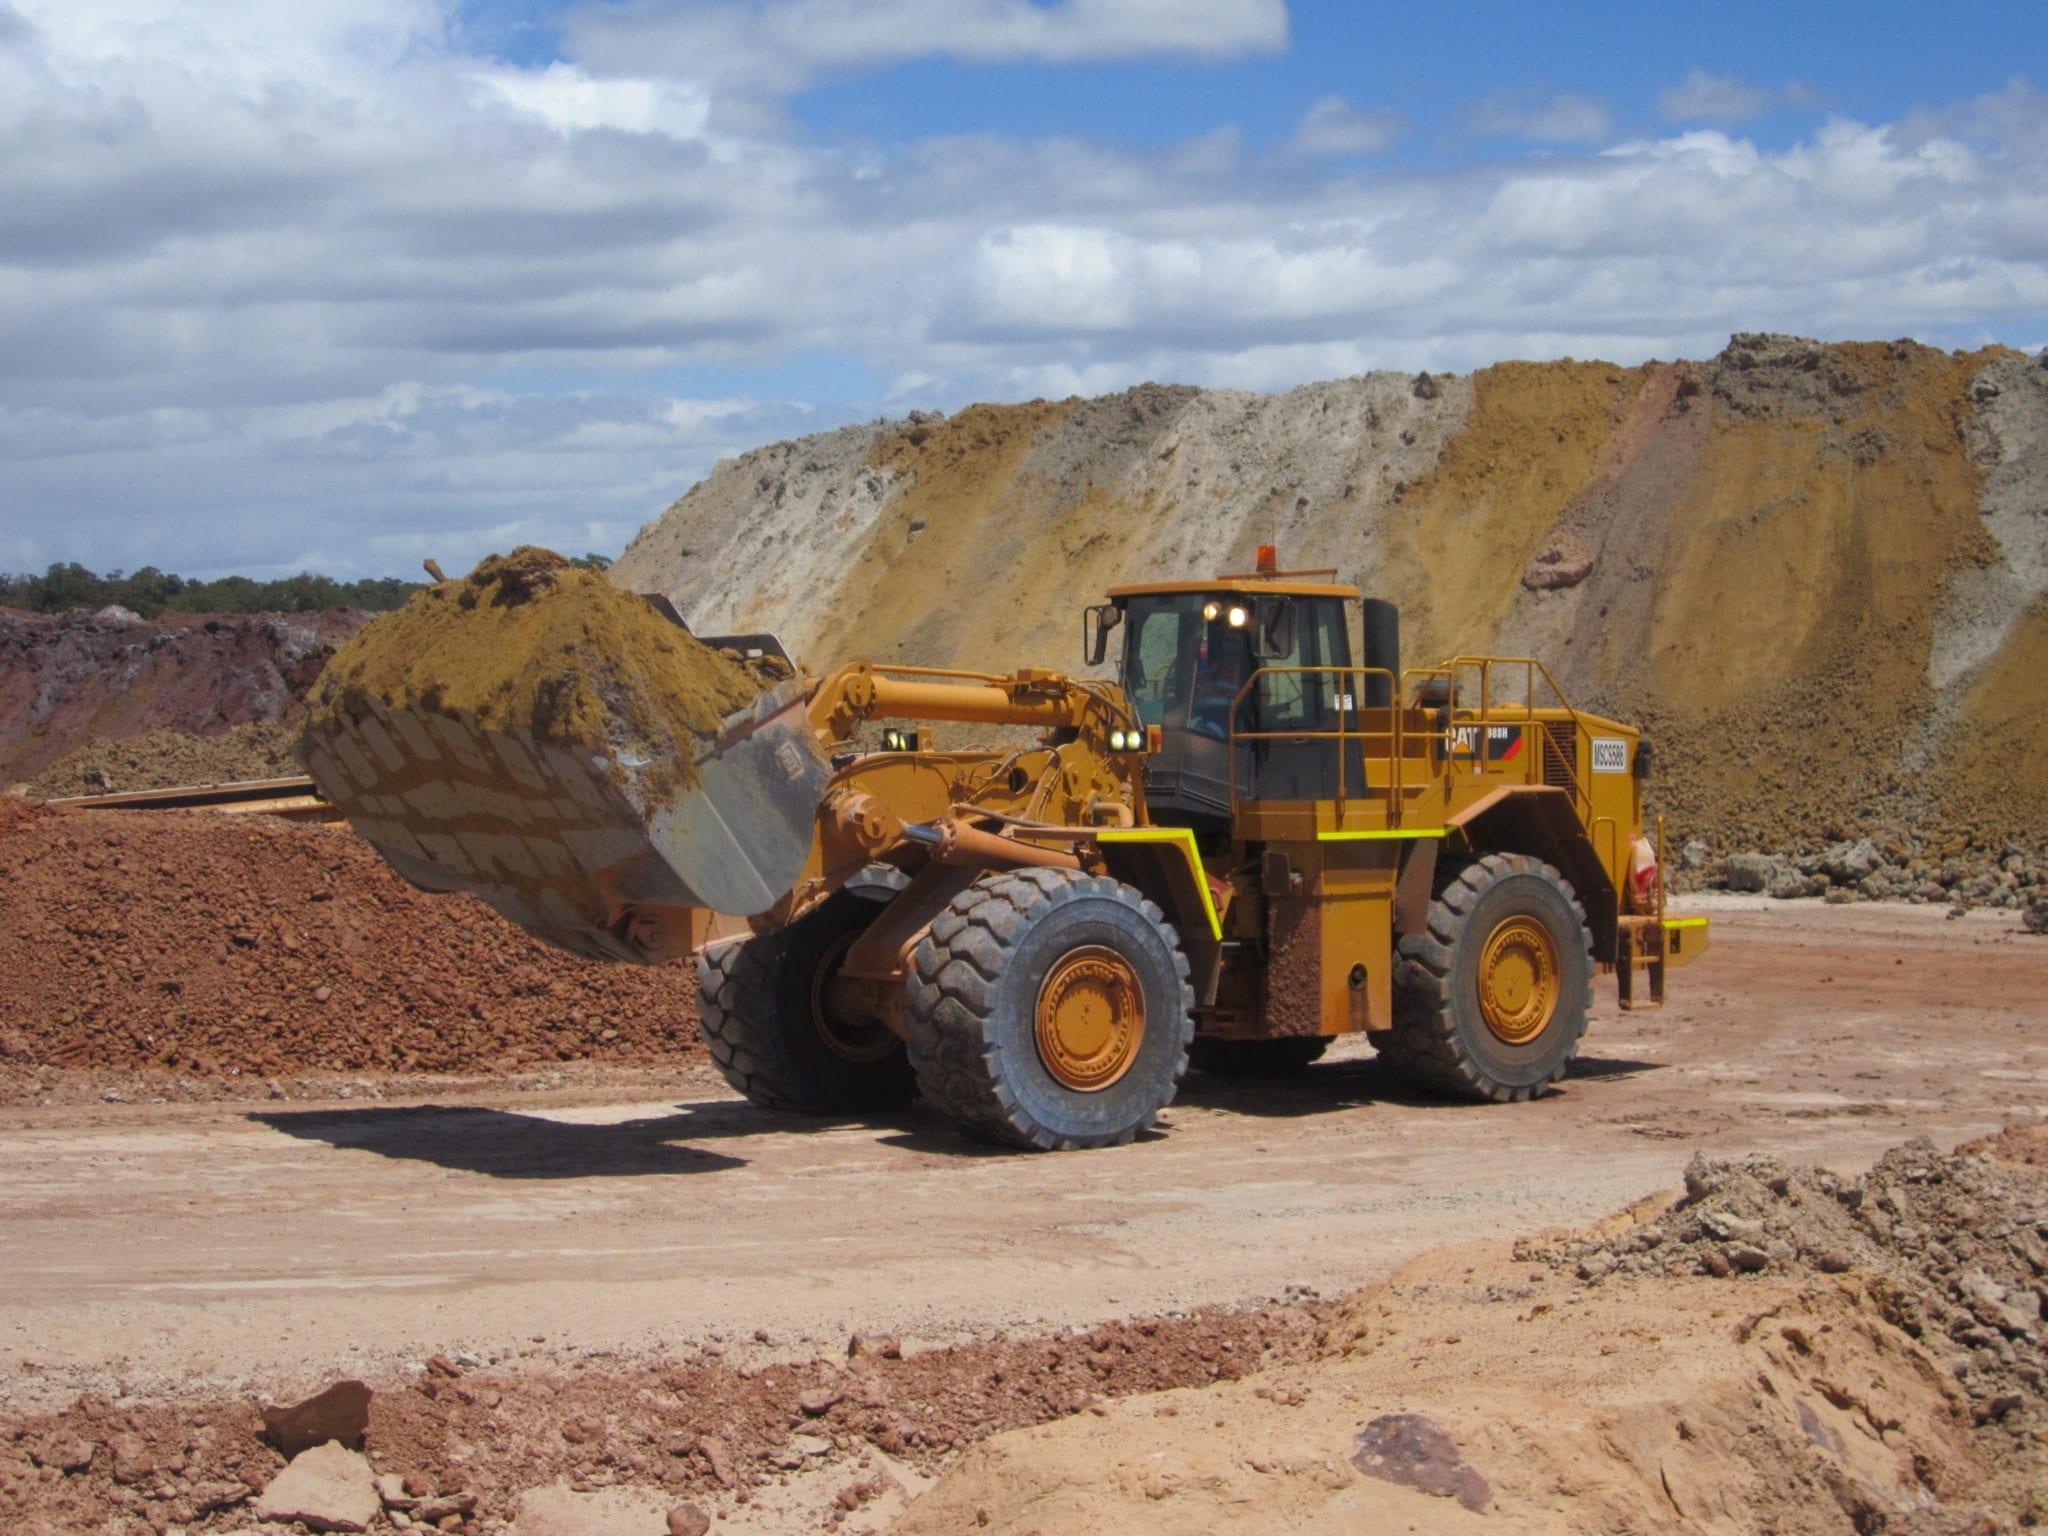 Loader Capability Mine Site Construction Services WA Western Australia